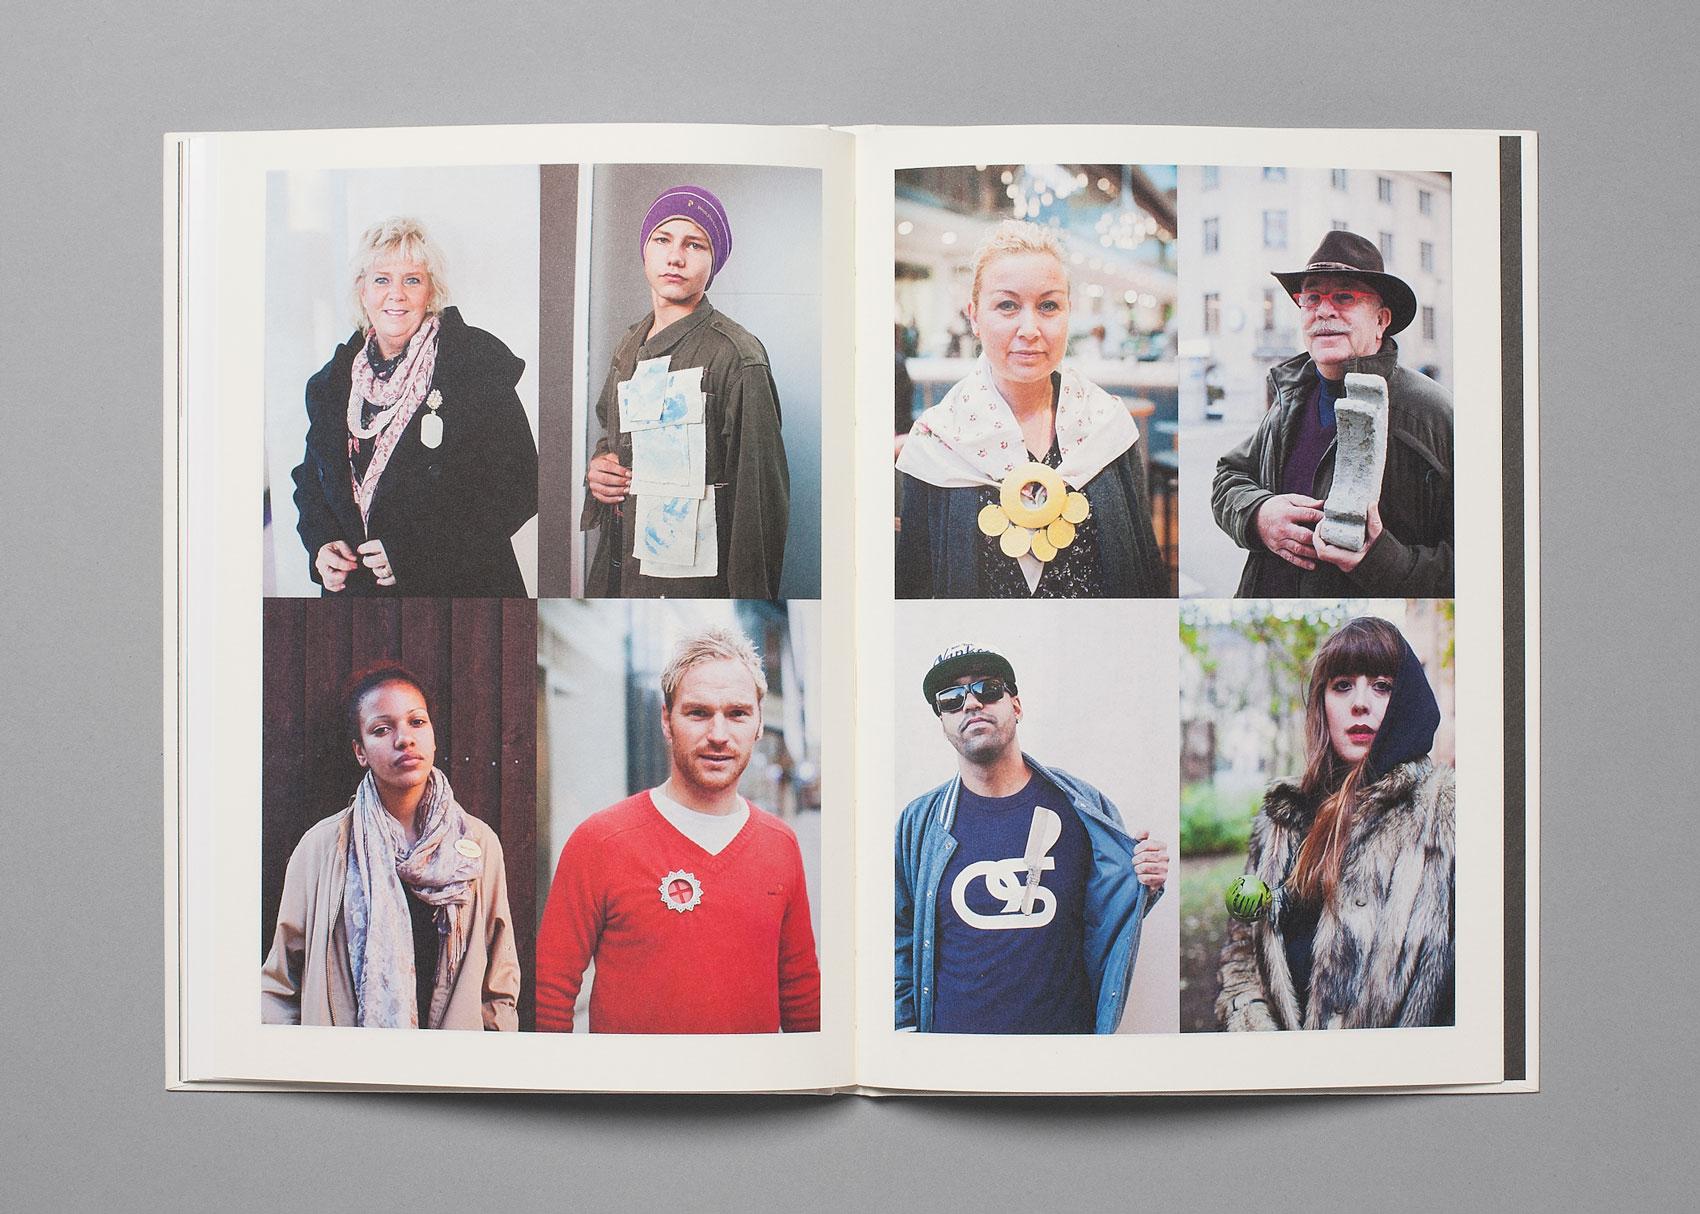 Alla_katalog_raka08_1700_portraits